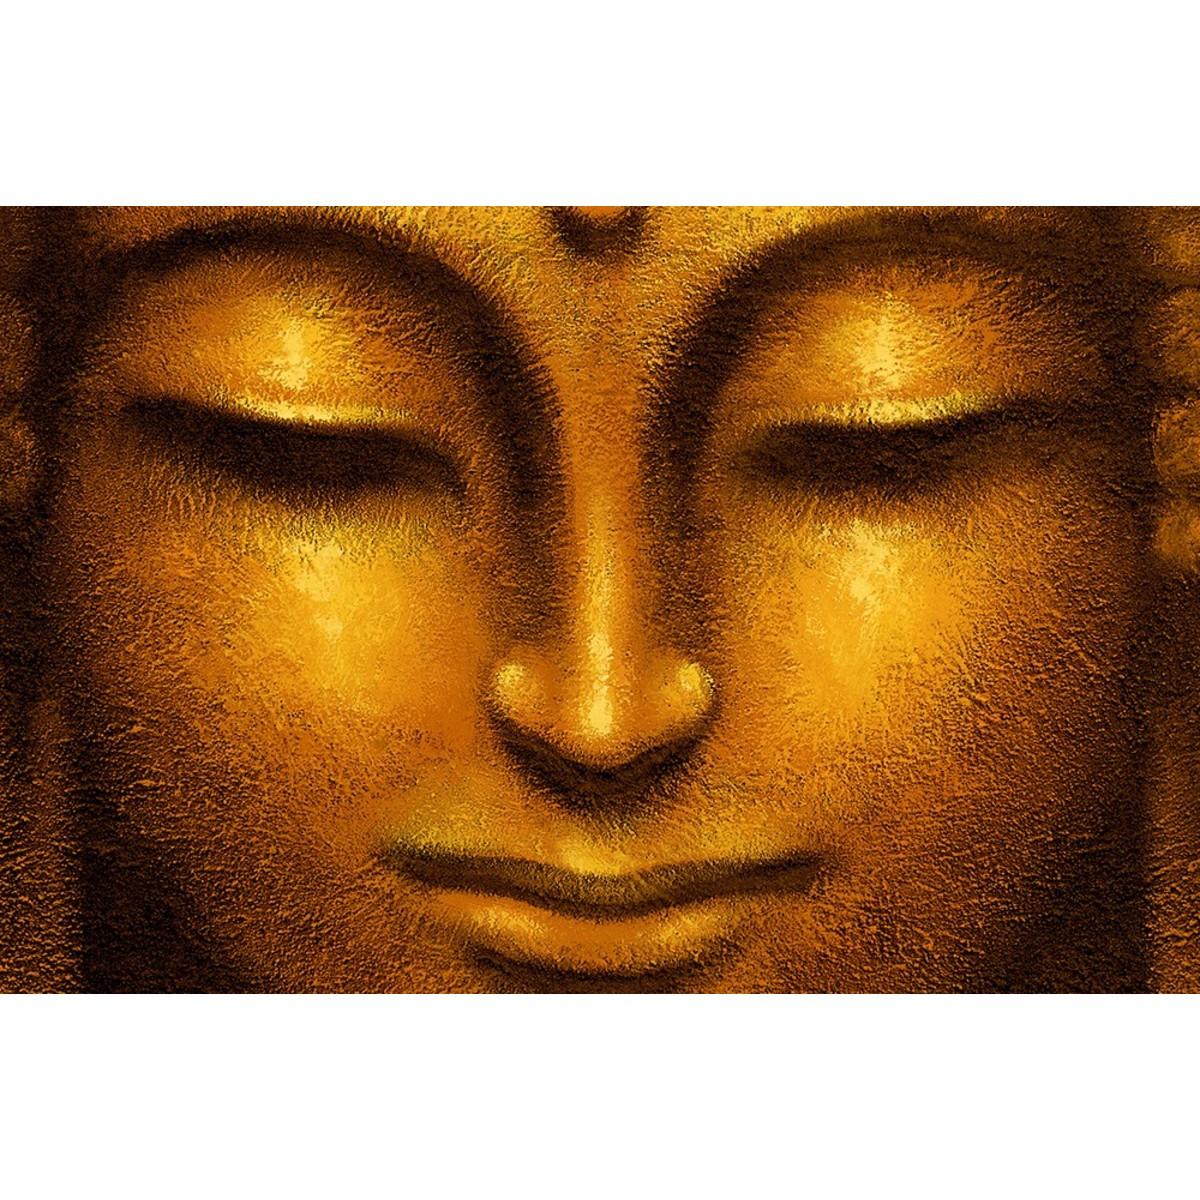 Фотообои W+G Giant Art Nataraja Siddhartha 00663WG 175х150 см